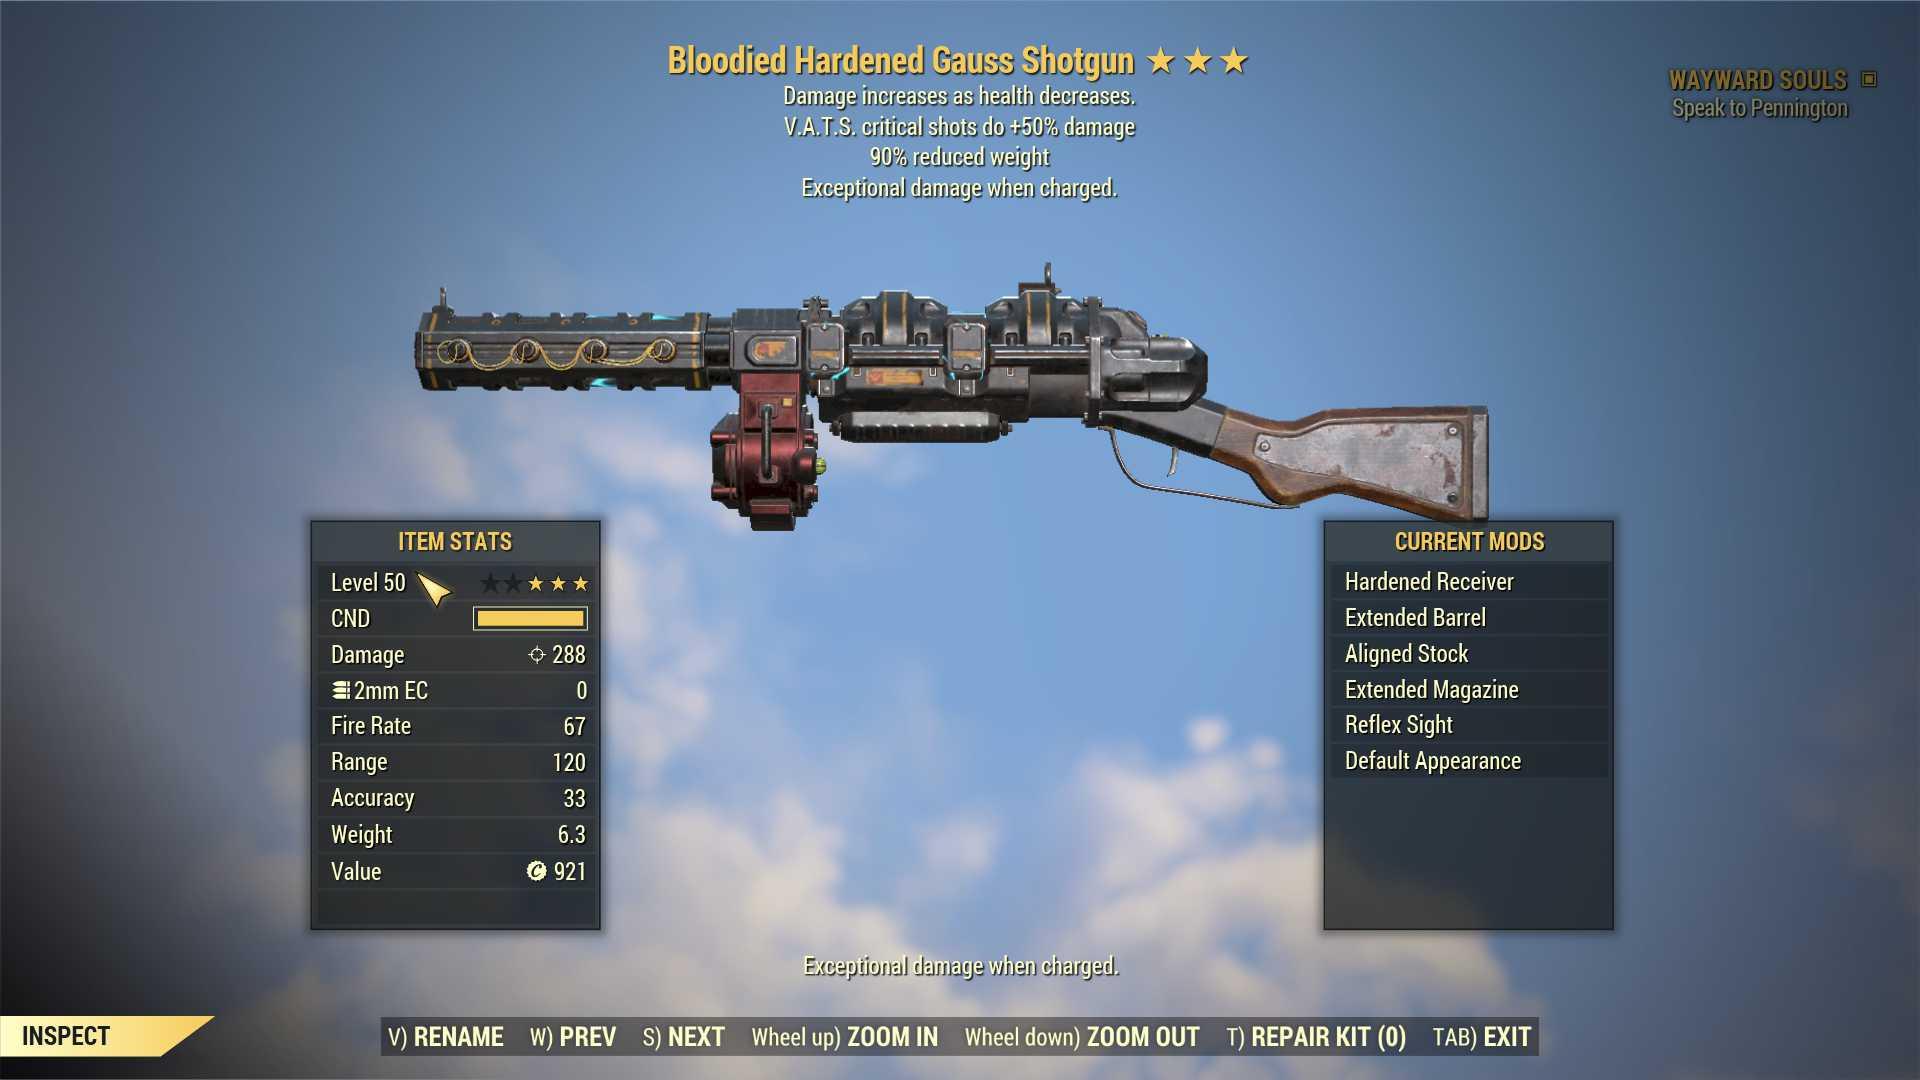 Bloodied Gauss Shotgun (+50% critical damage, 90% reduced weight) FULL MODDED [Wastelanders]